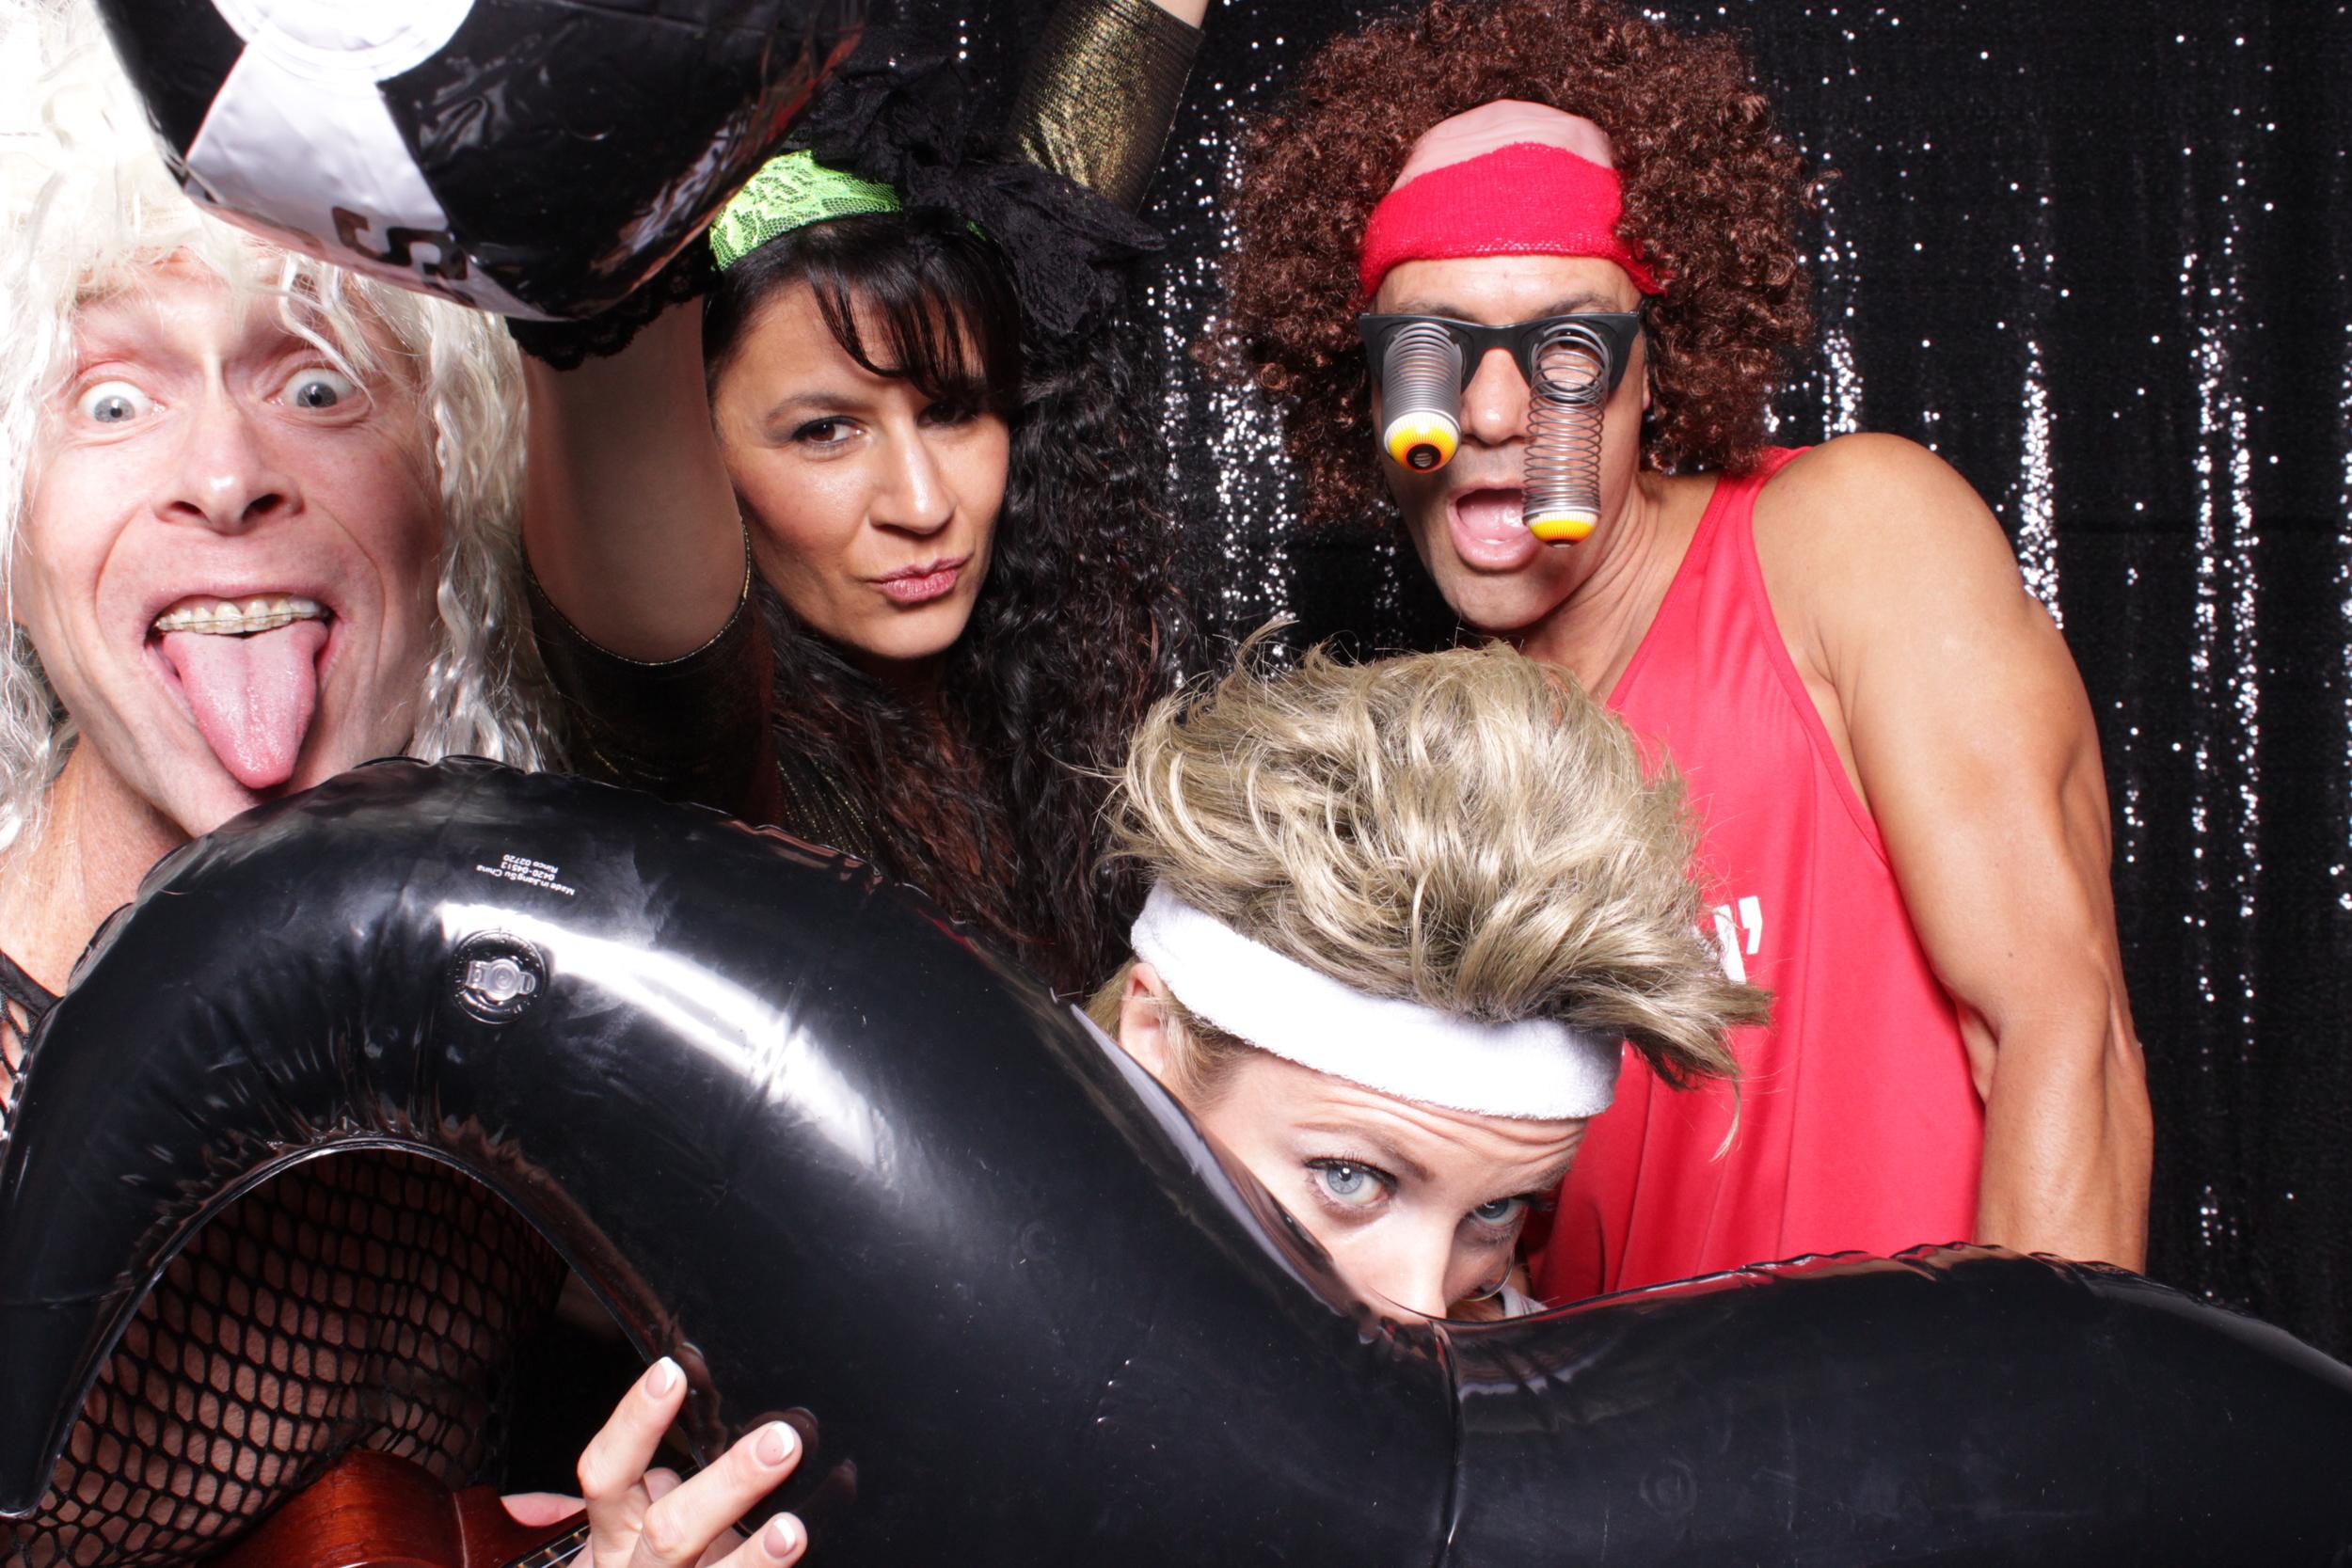 chico-california-open-air-photo-booth-rental-halloween-party-fun-mustache